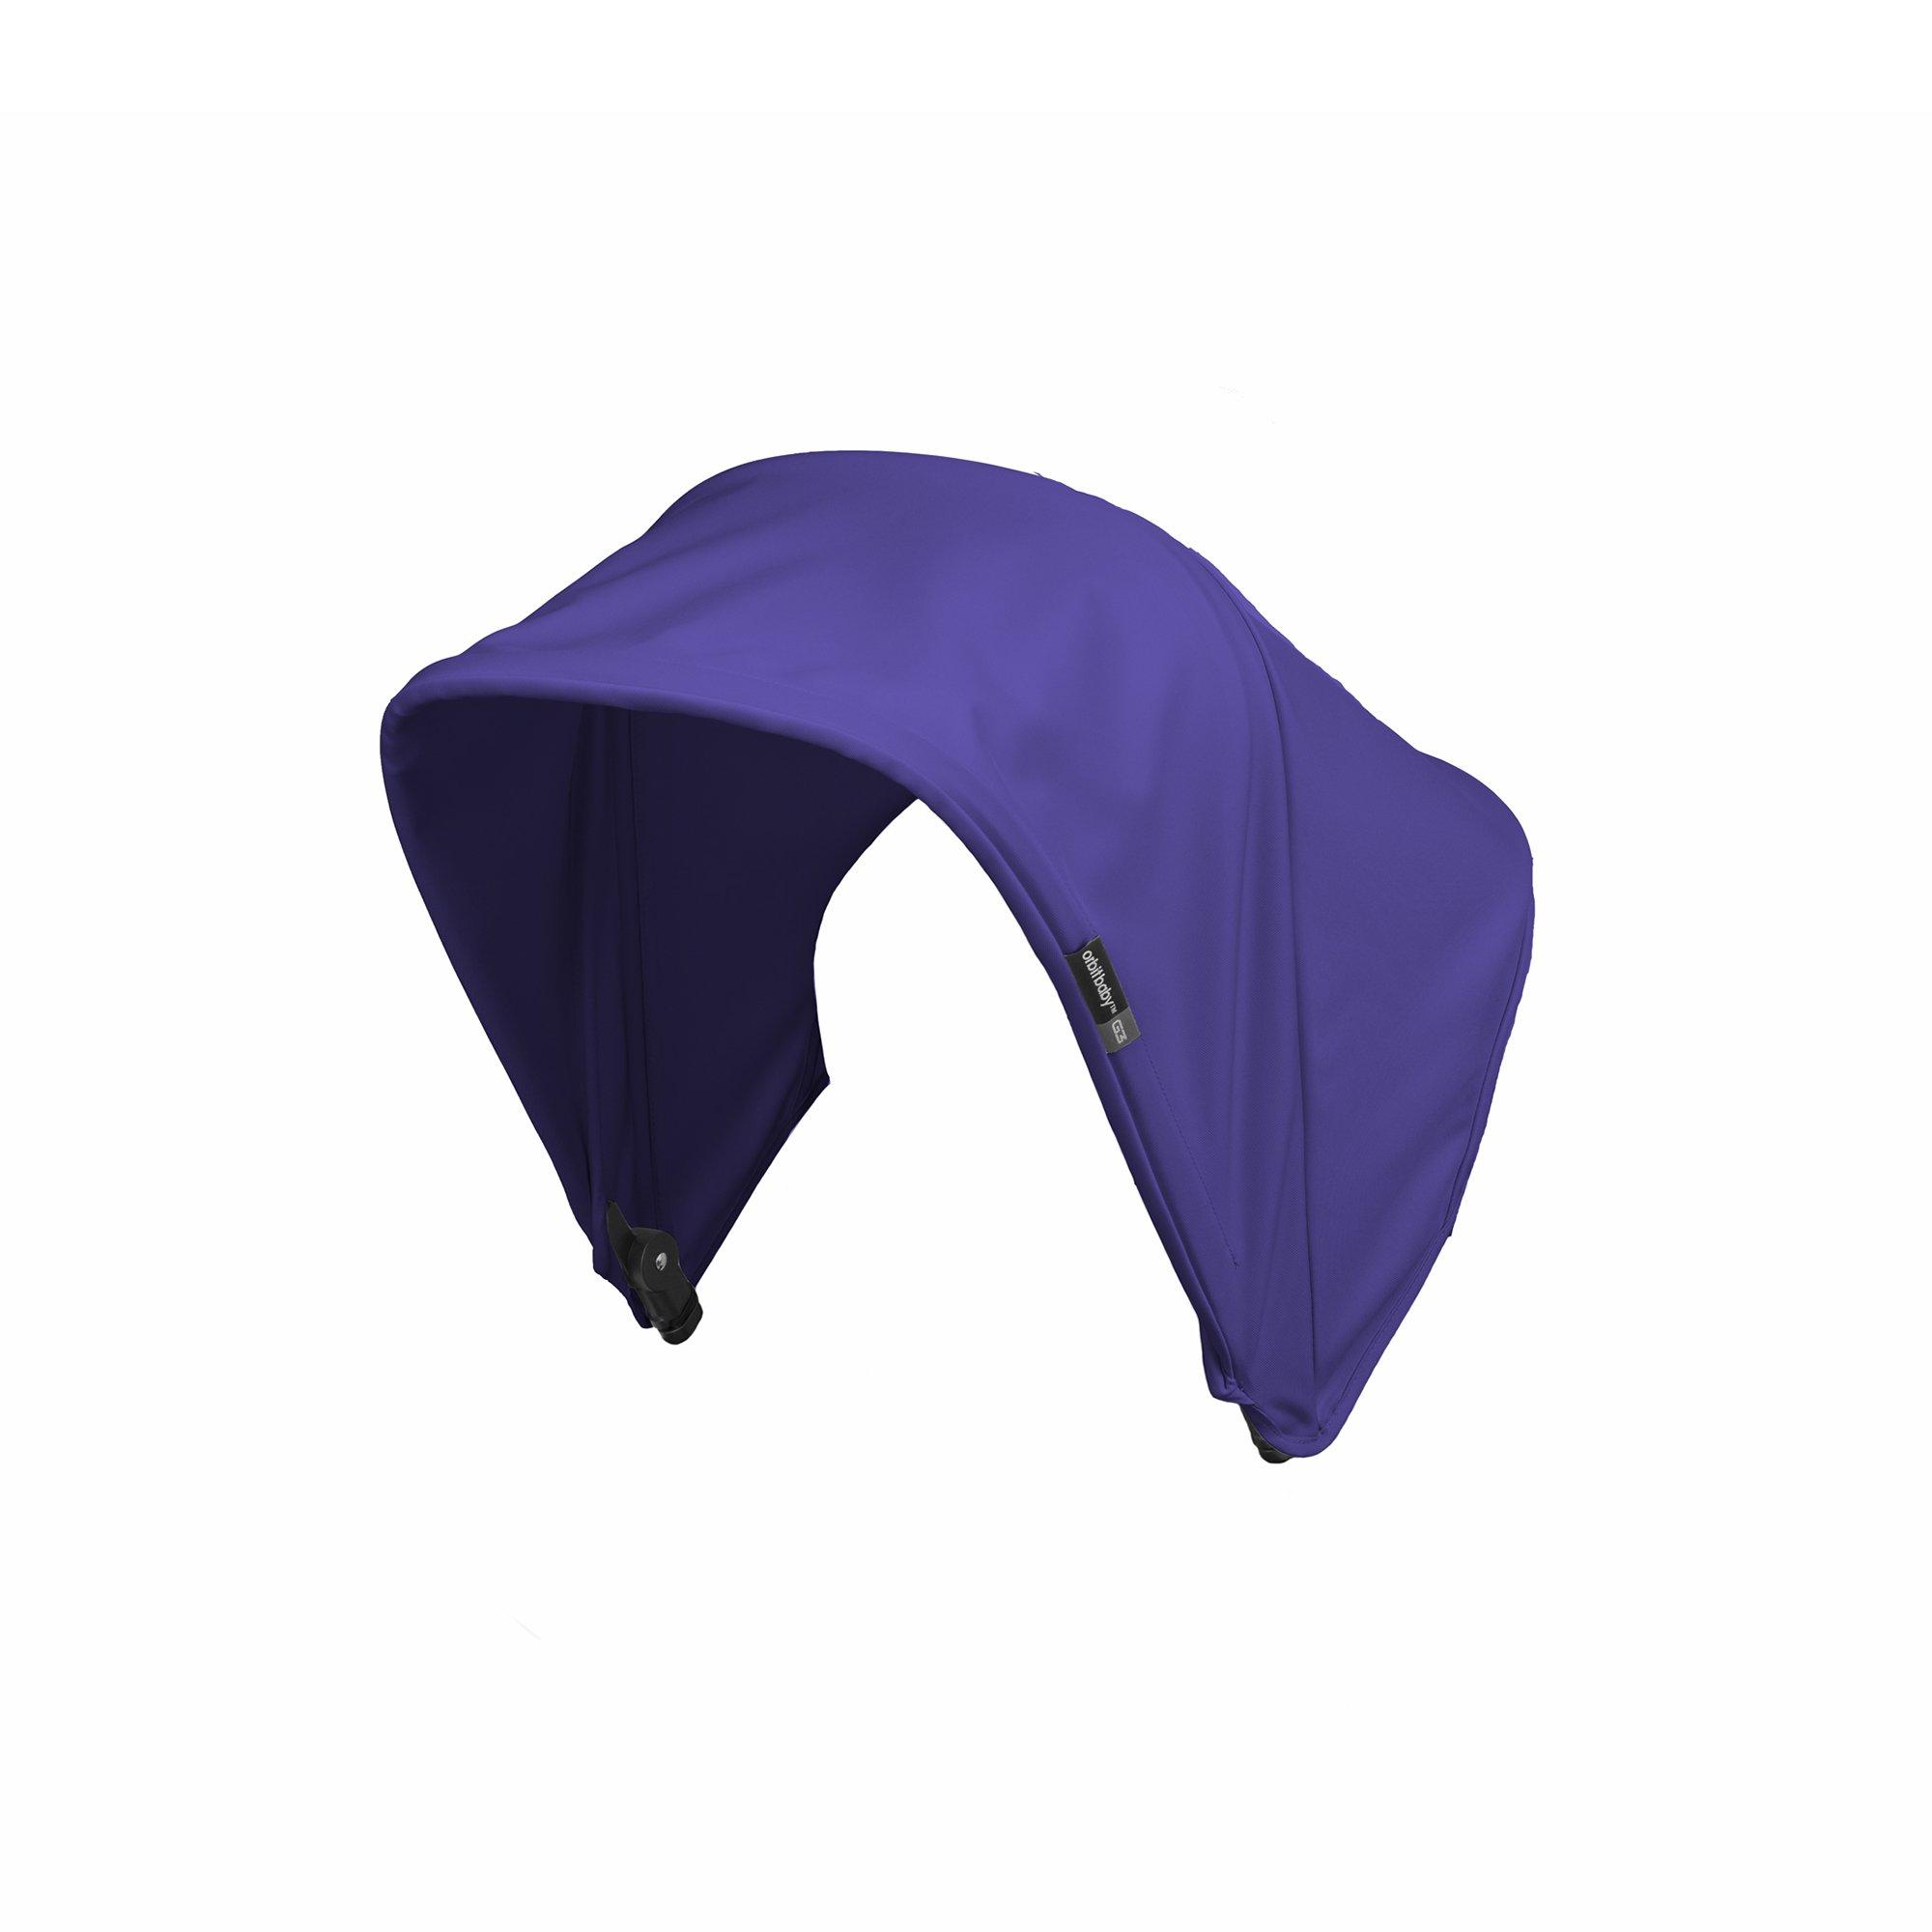 Orbit Baby G3 Stroller Sunshade, Blueberry